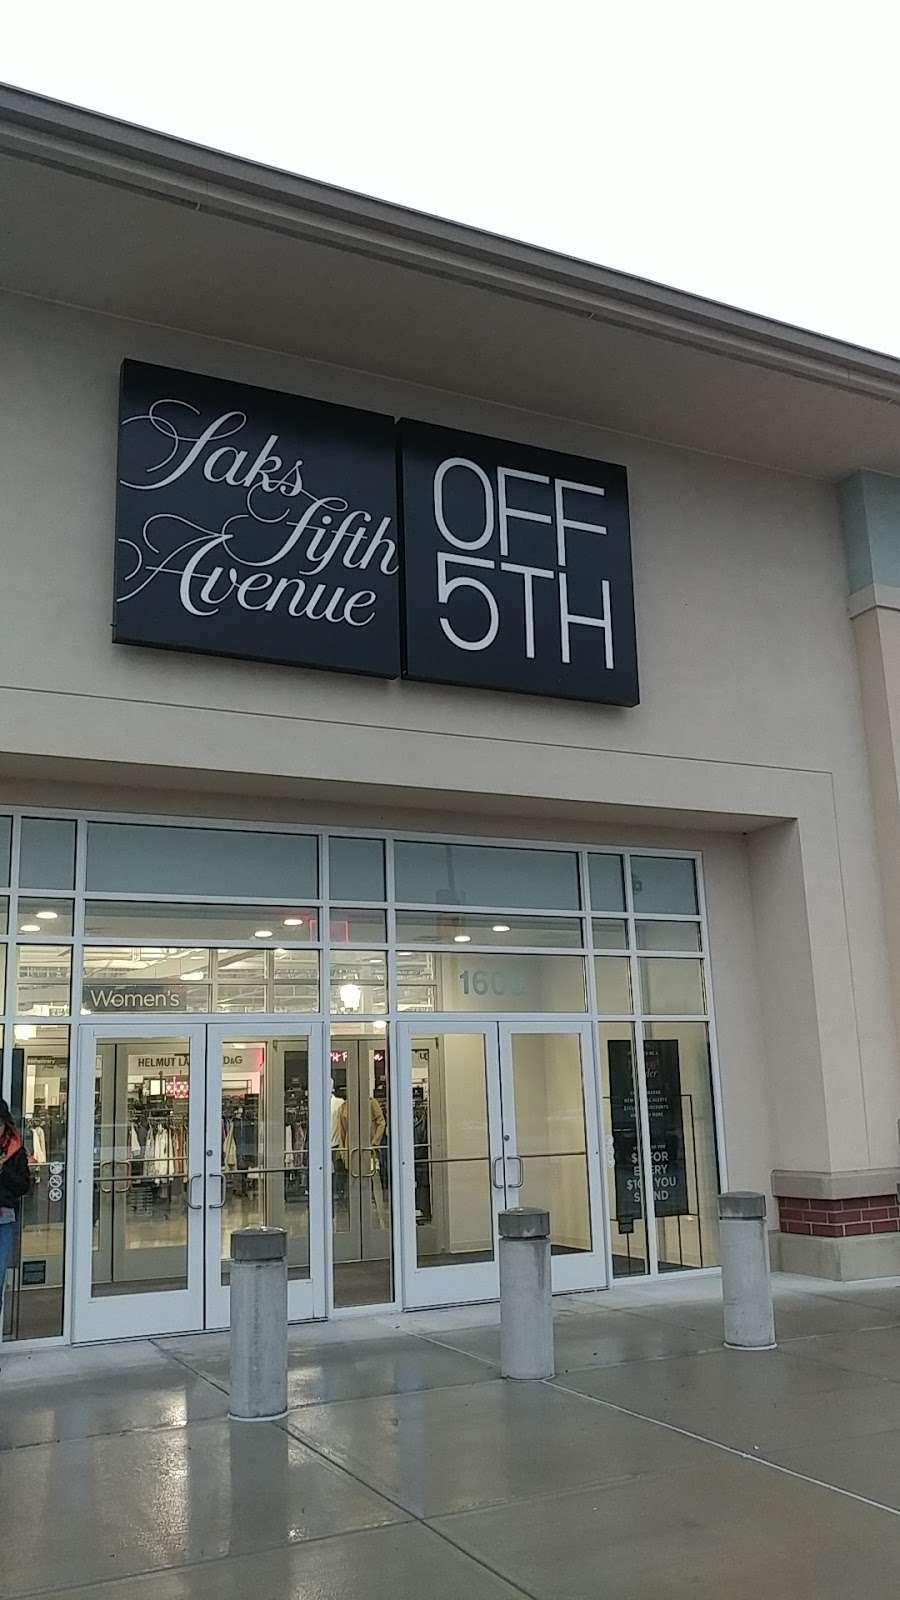 Saks OFF 5TH - department store  | Photo 6 of 10 | Address: 1650 Premium Outlet Blvd #1600, Aurora, IL 60502, USA | Phone: (331) 212-3950